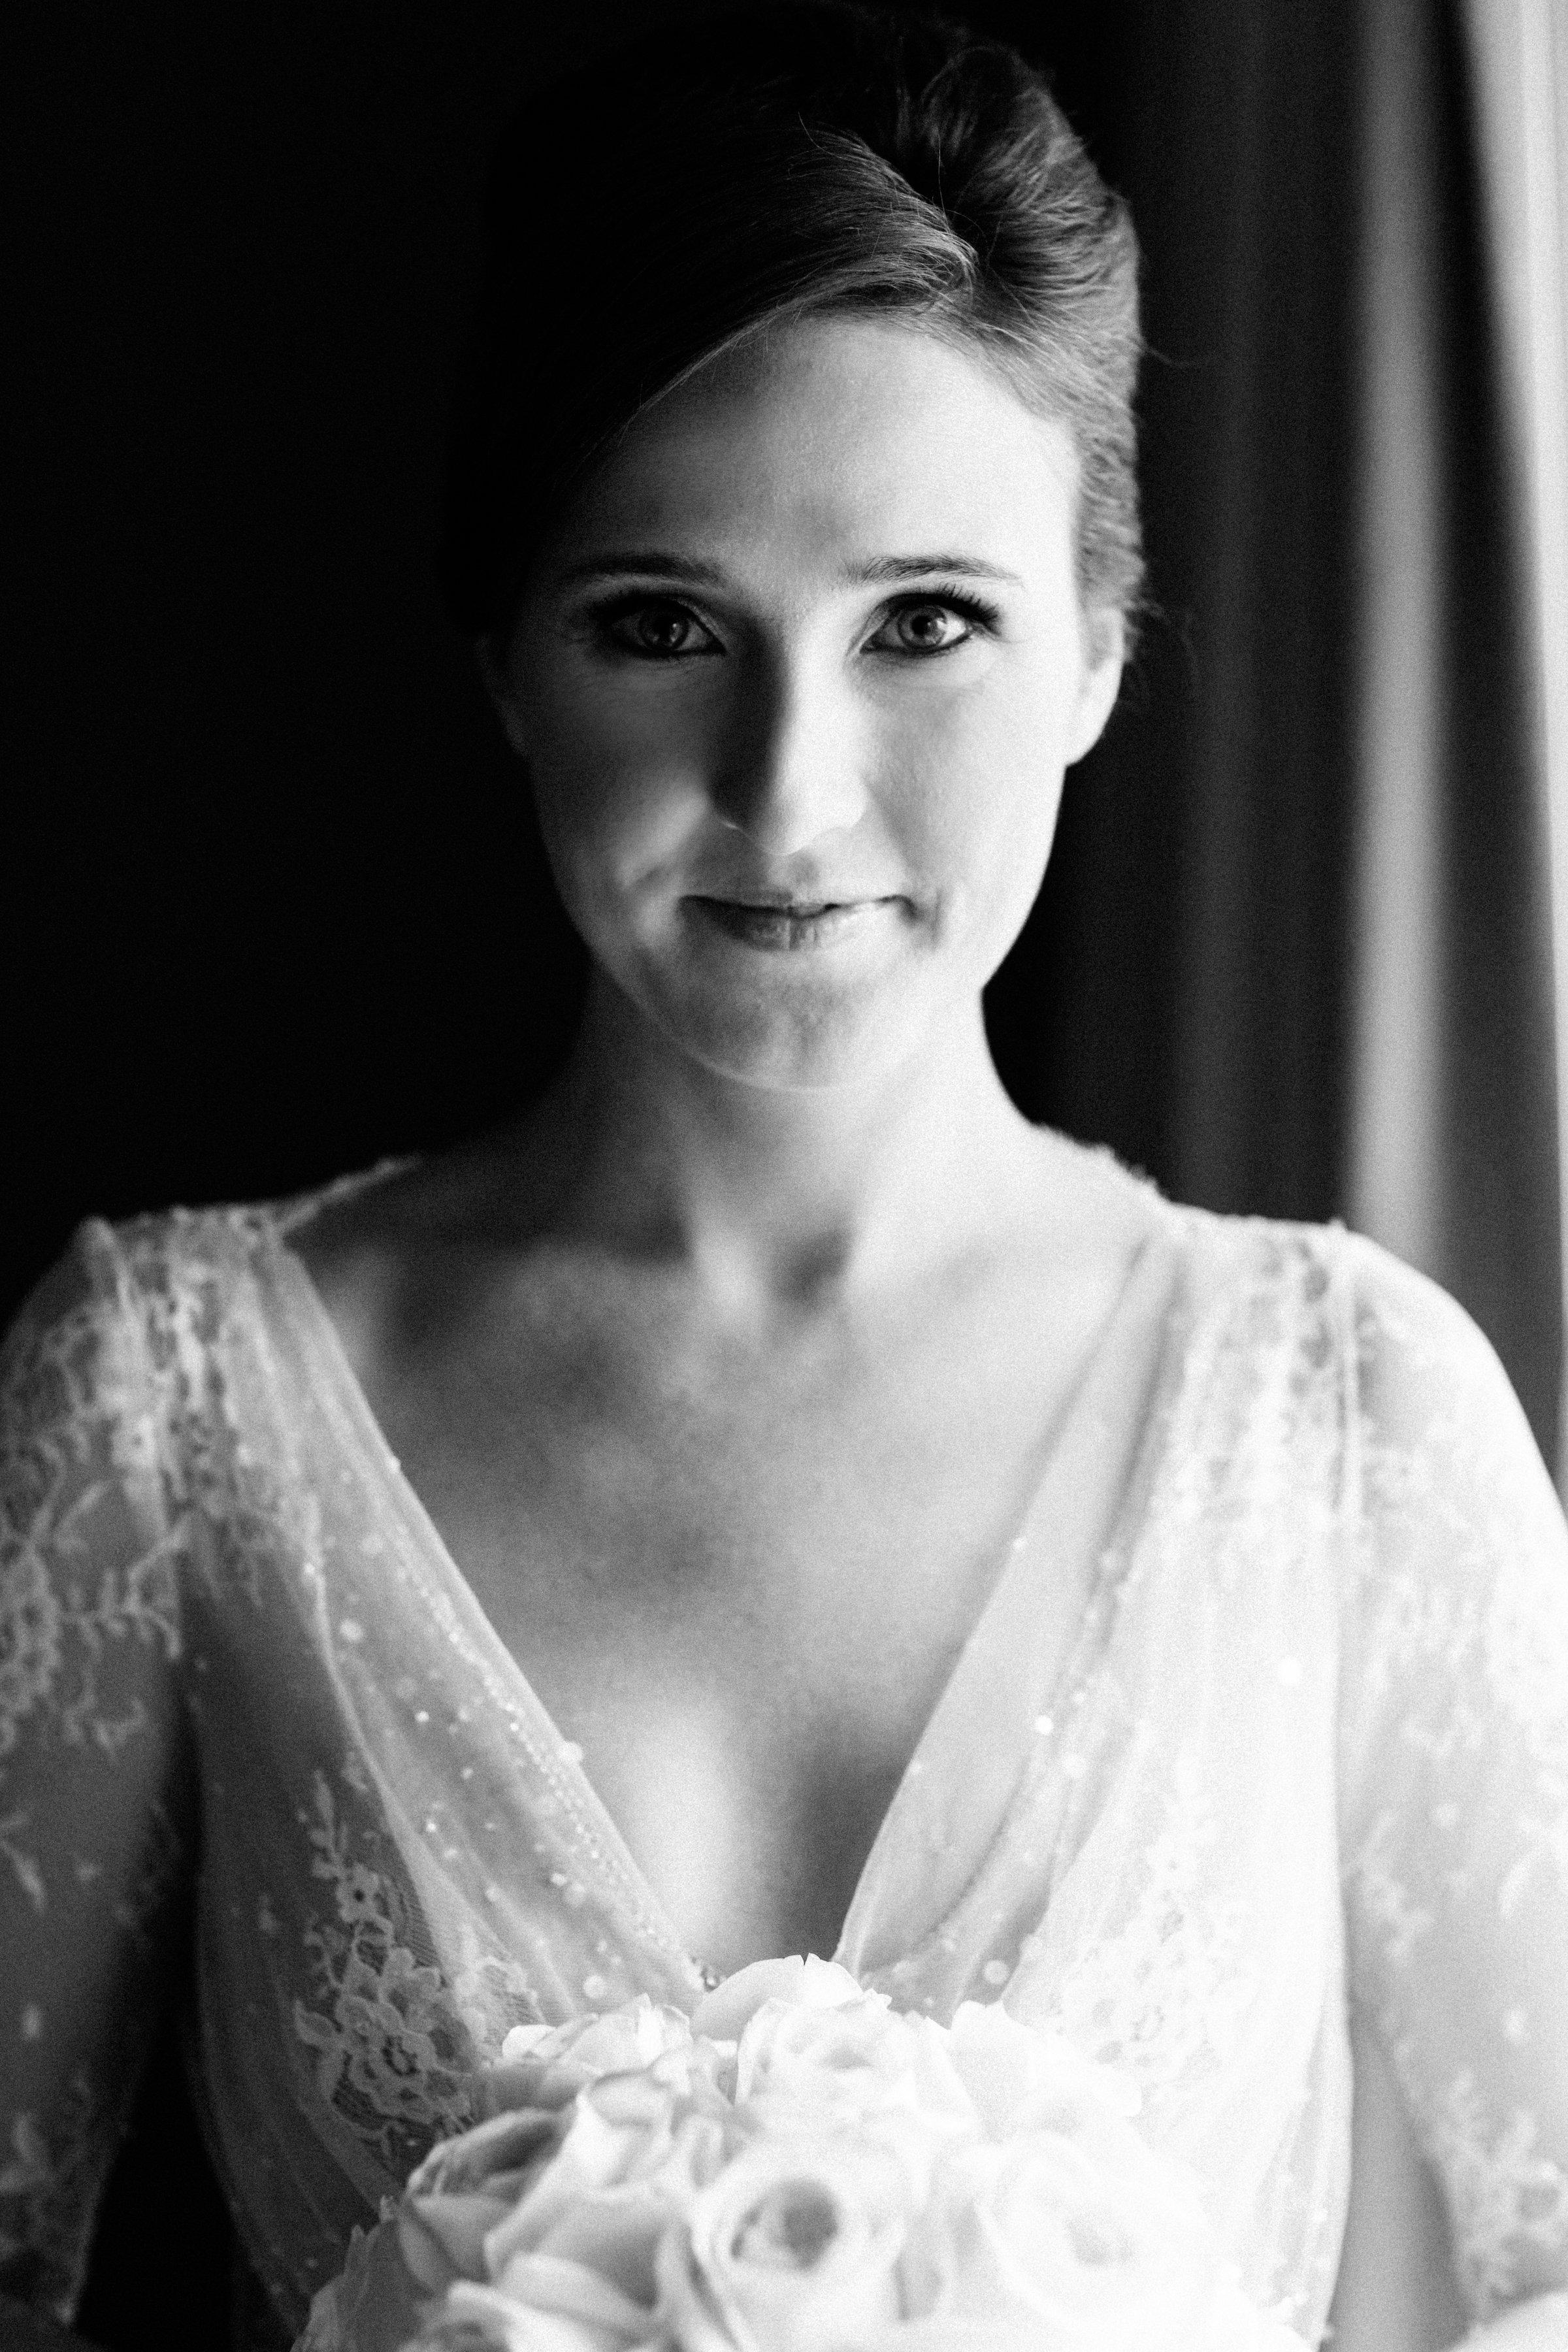 Chicago Bridal Portrait Photography